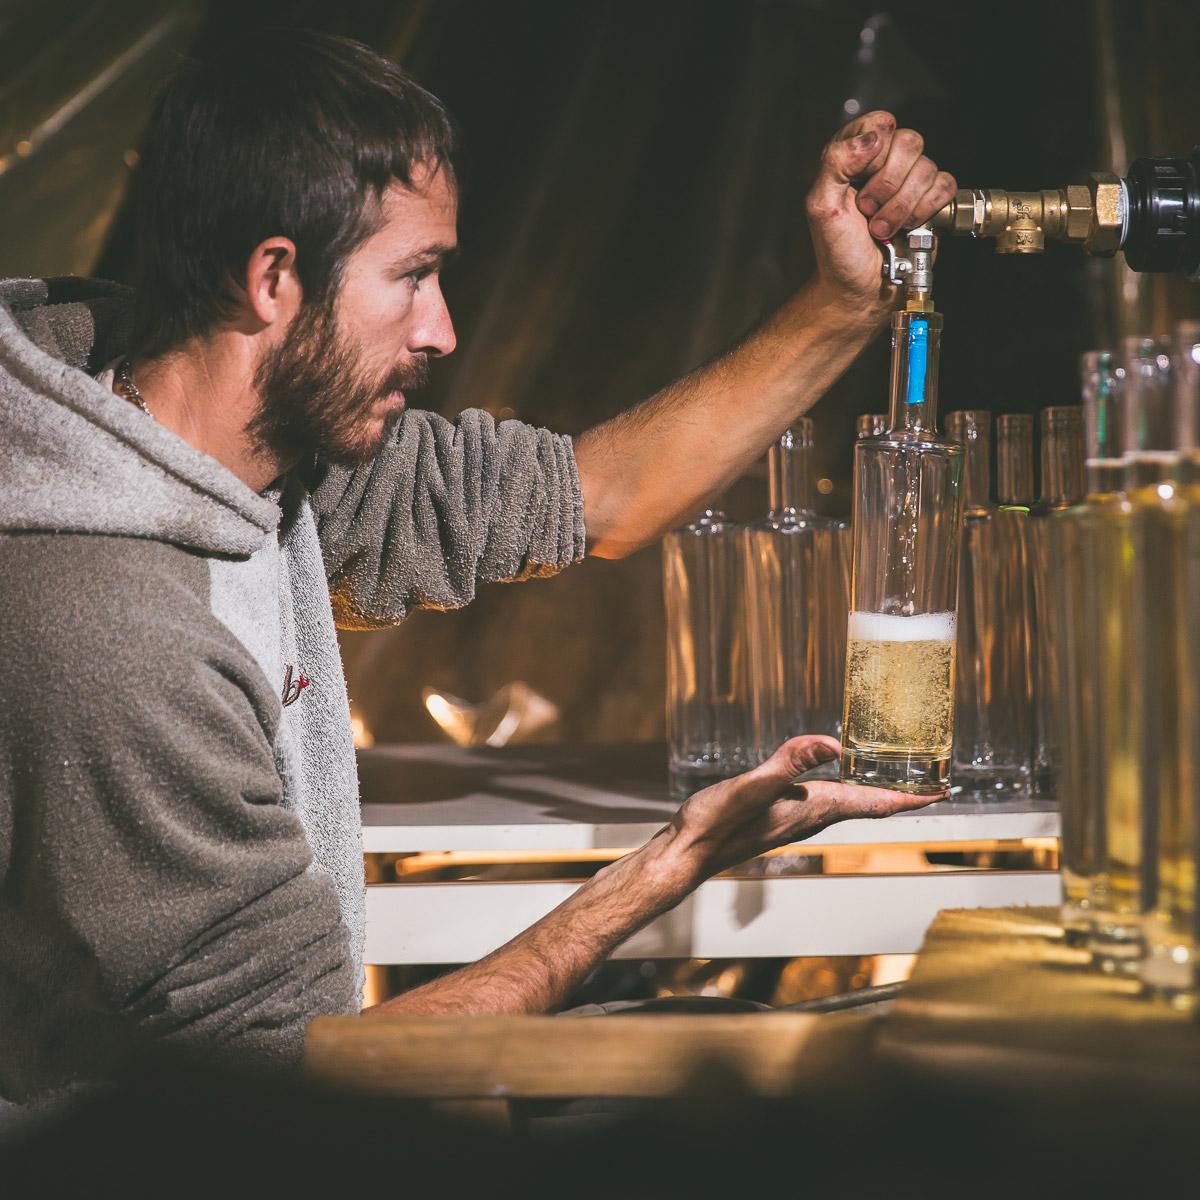 https://www.lasource-distillerie.fr/wp-content/uploads/2019/06/photos-felix-groizard-florent-augay-la-source-distillerie-1200x1200-8.jpg